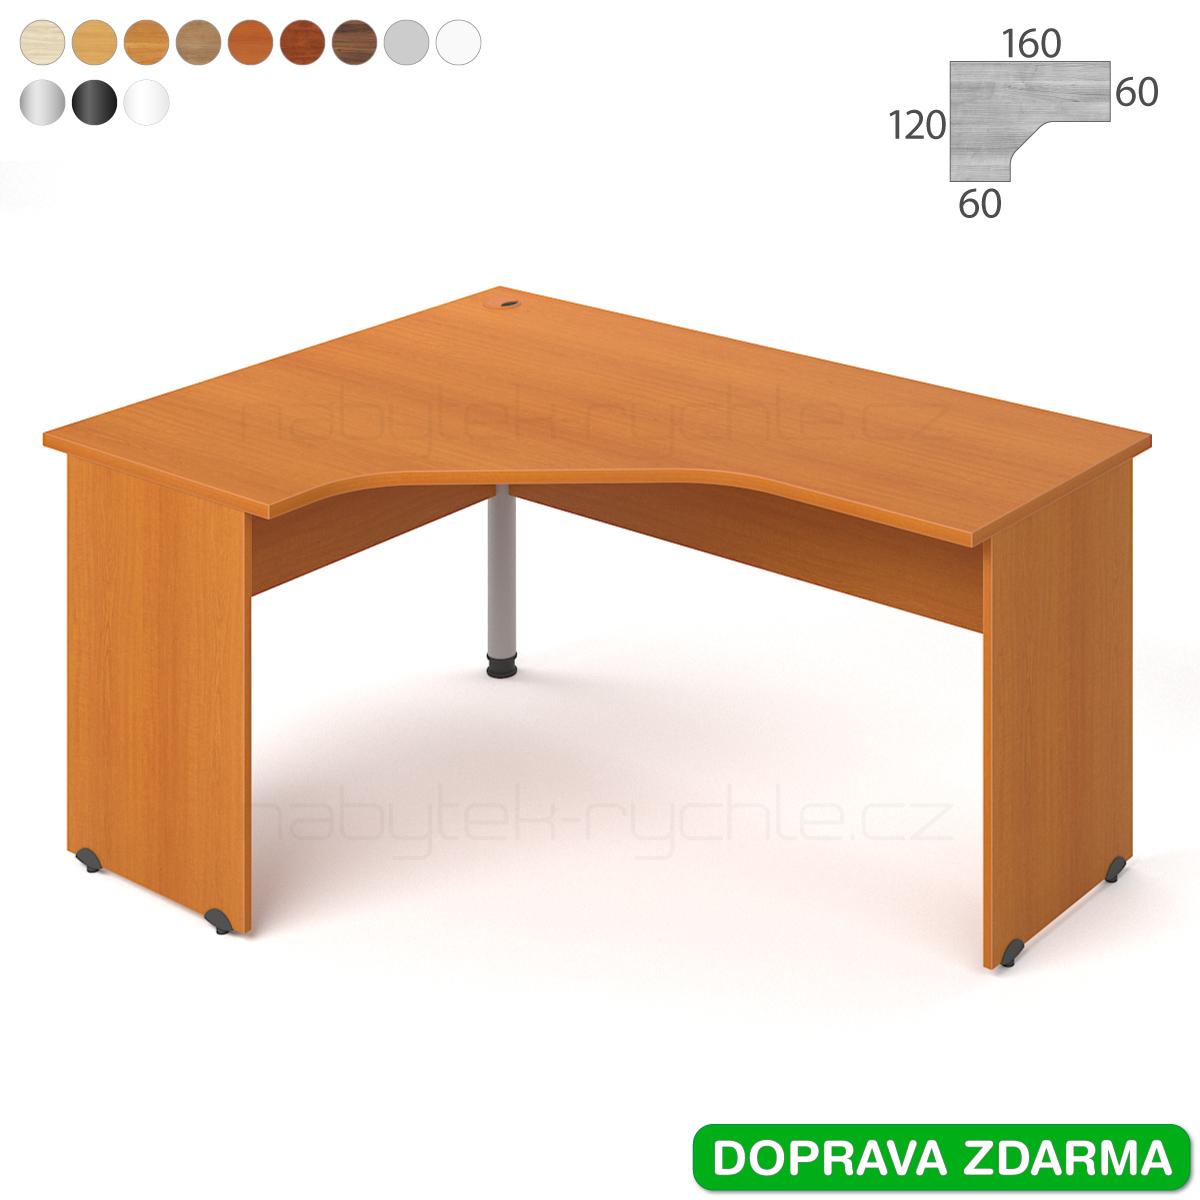 GEV 60 P Hobis Gate - Stůl 160 x 120